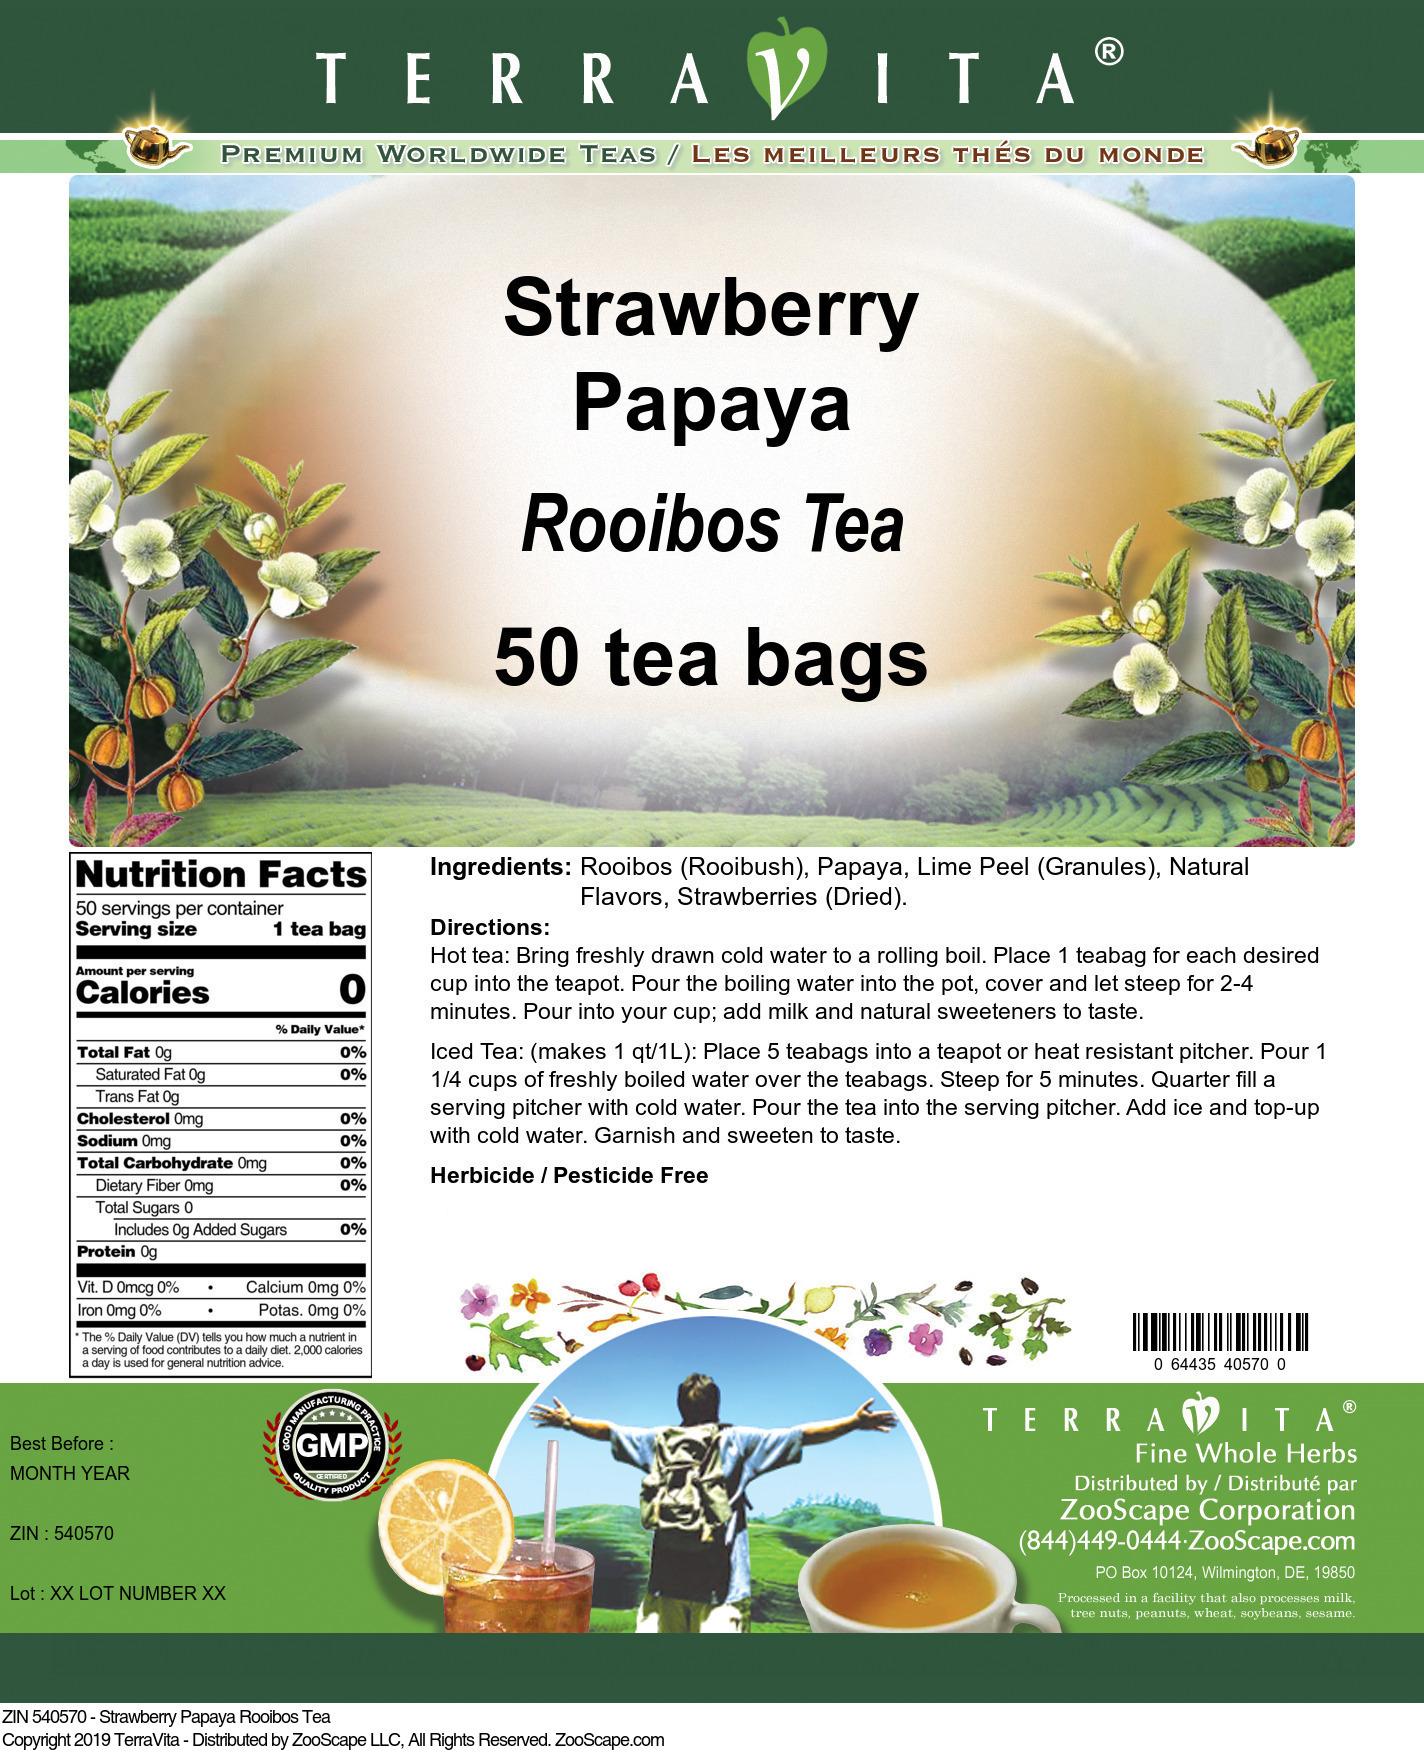 Strawberry Papaya Rooibos Tea